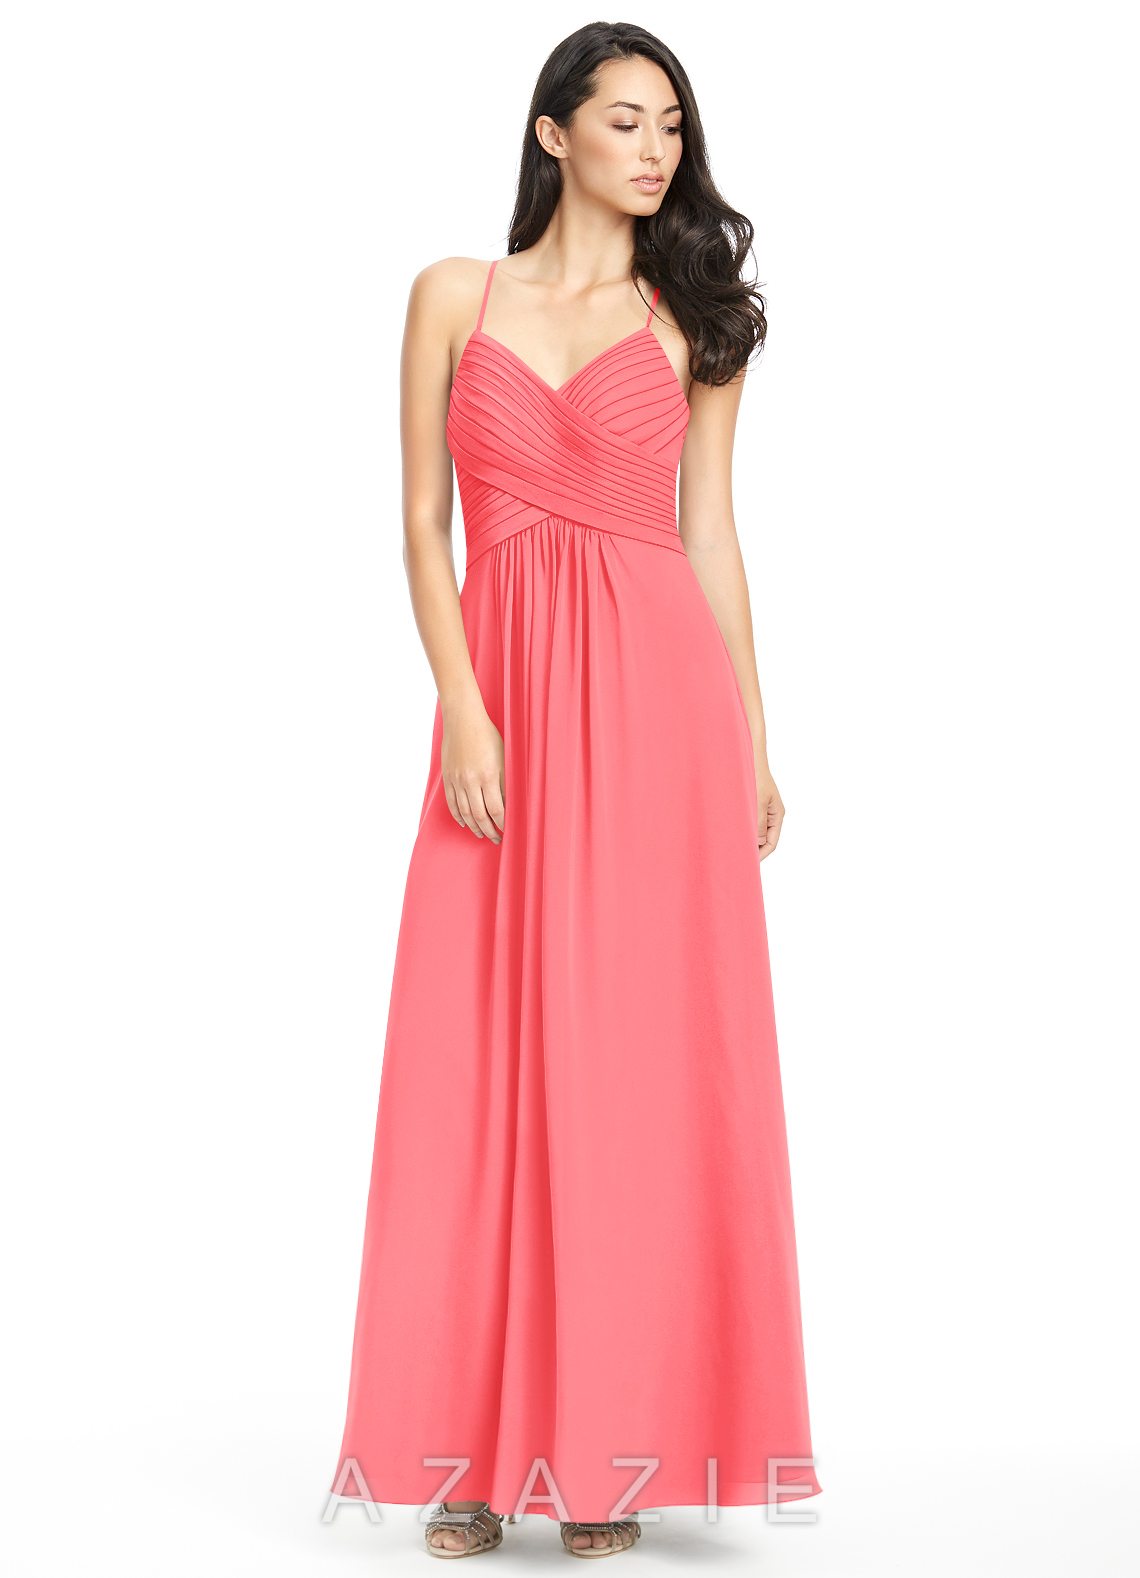 Azazie haleigh bridesmaid dress azazie color watermelon ombrellifo Image collections